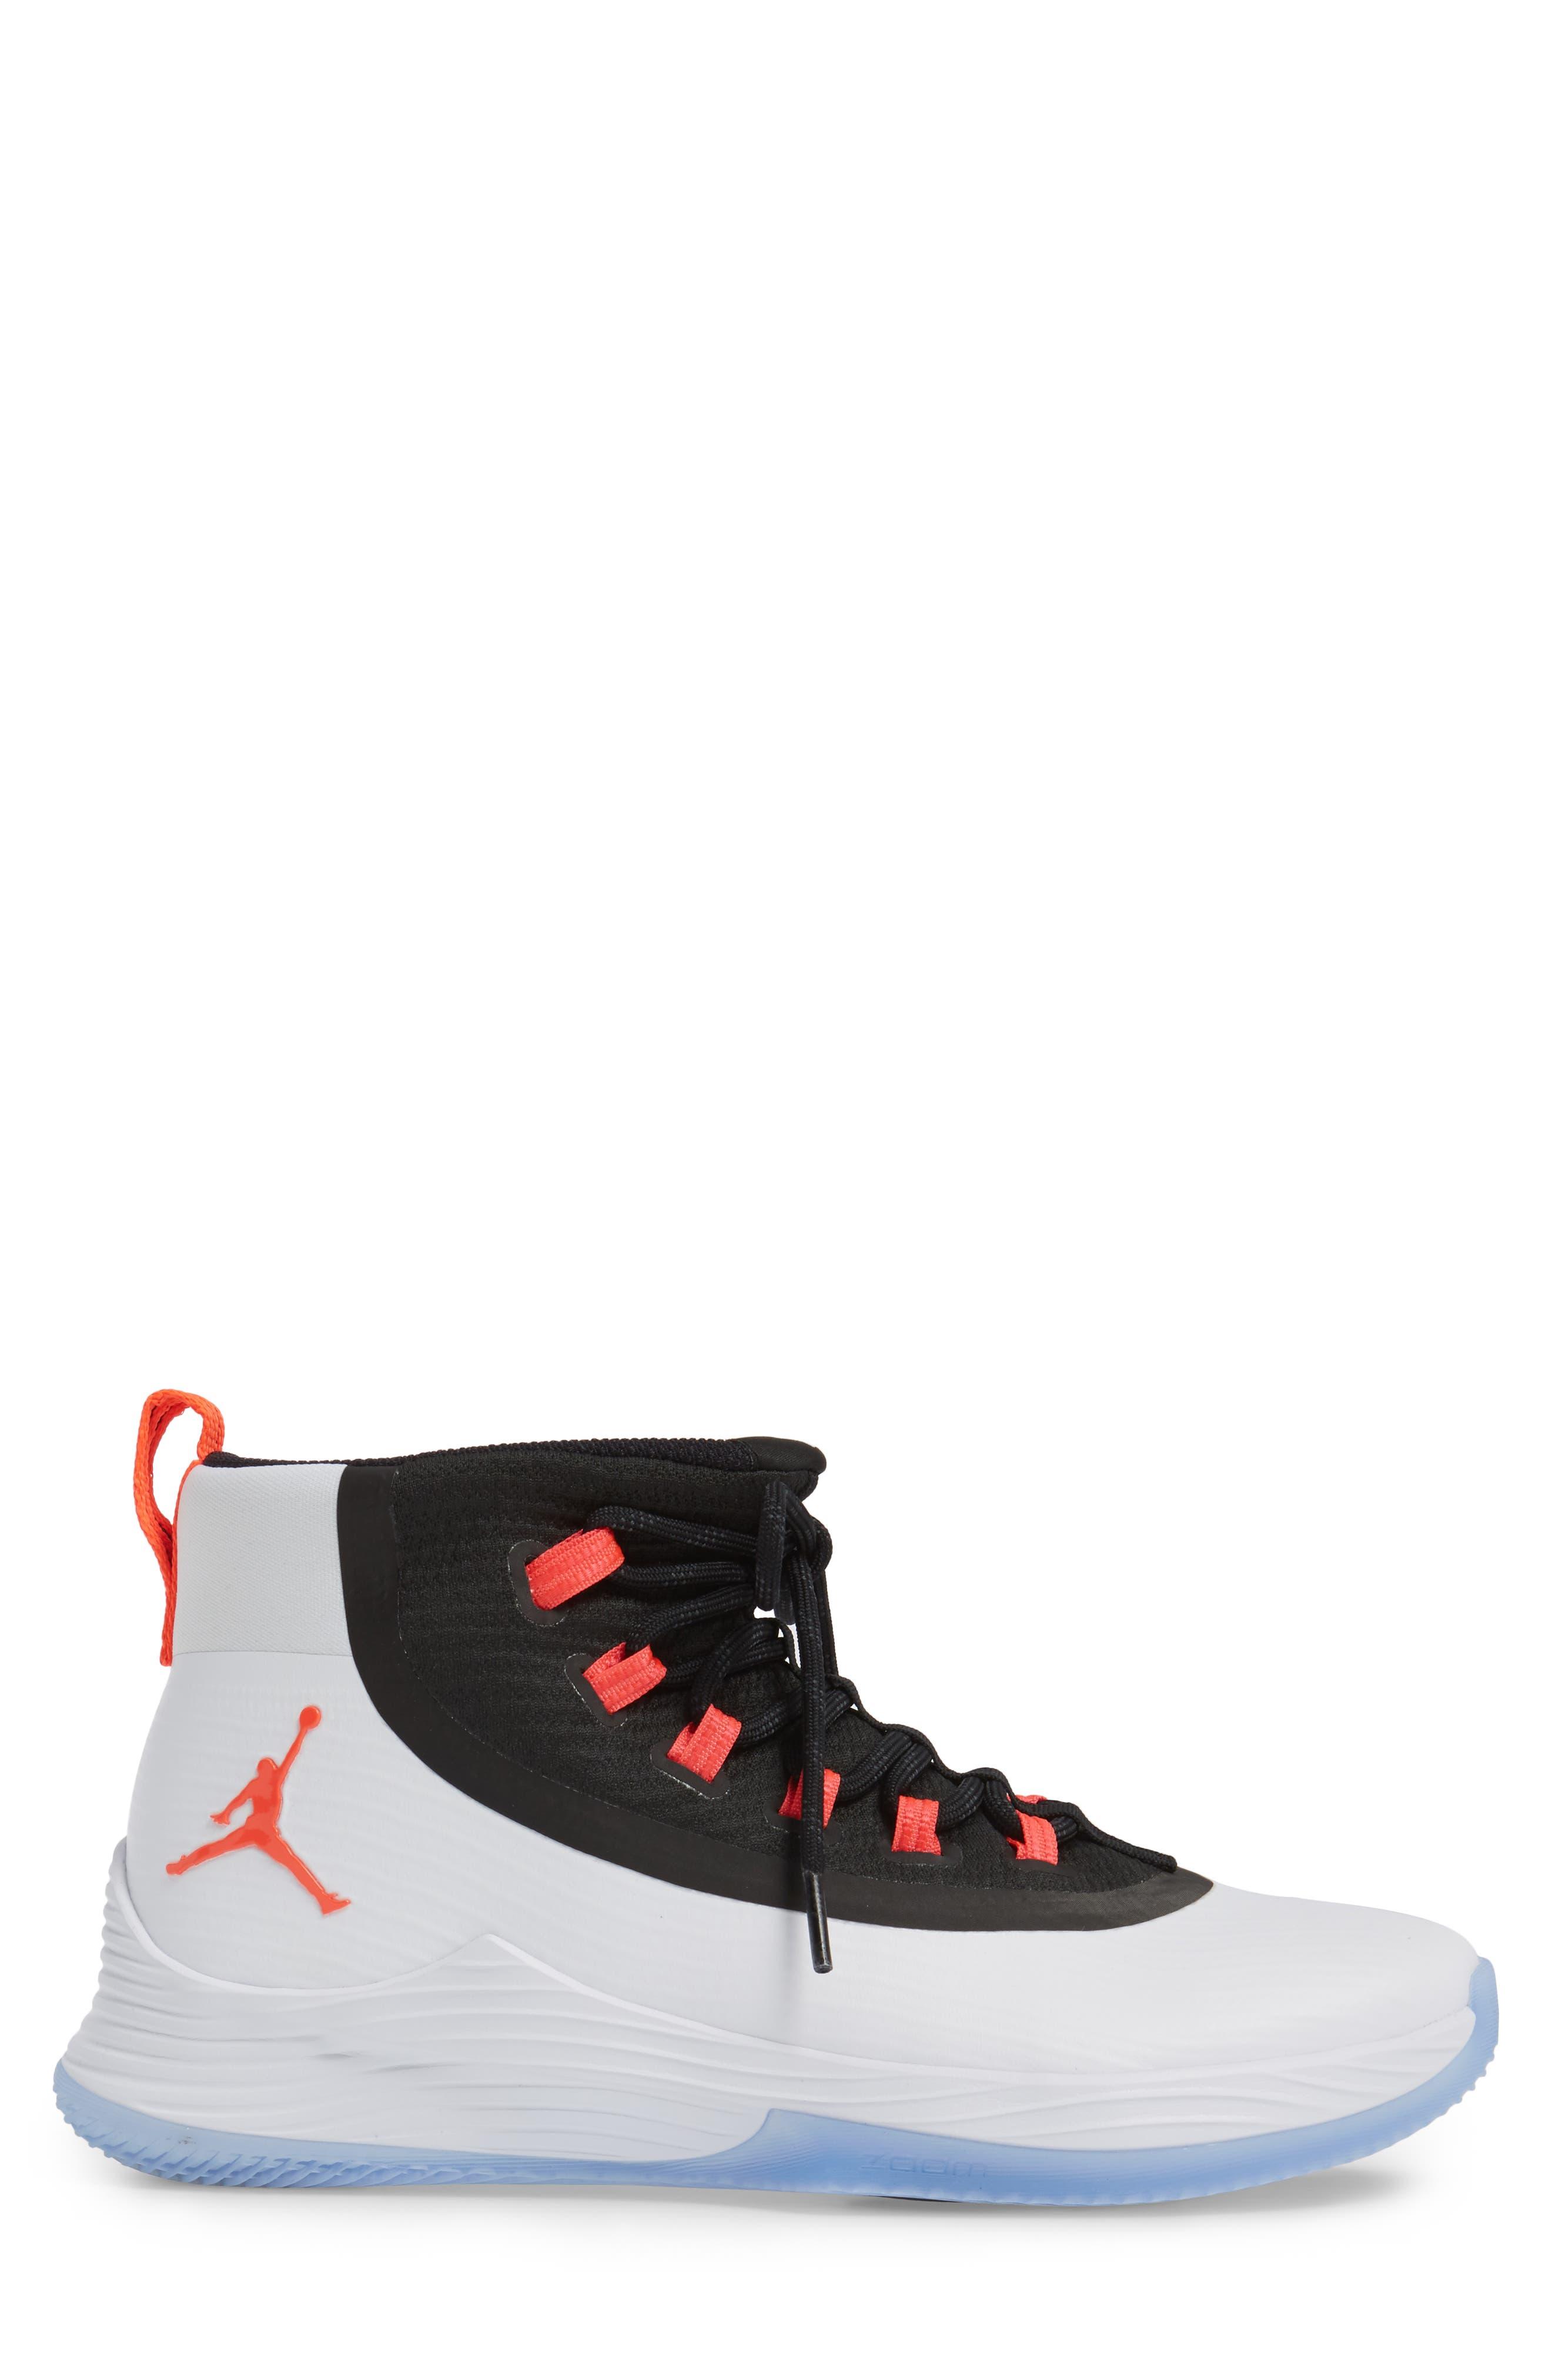 Jordan Ultra Fly 2 Basketball Shoe,                             Alternate thumbnail 10, color,